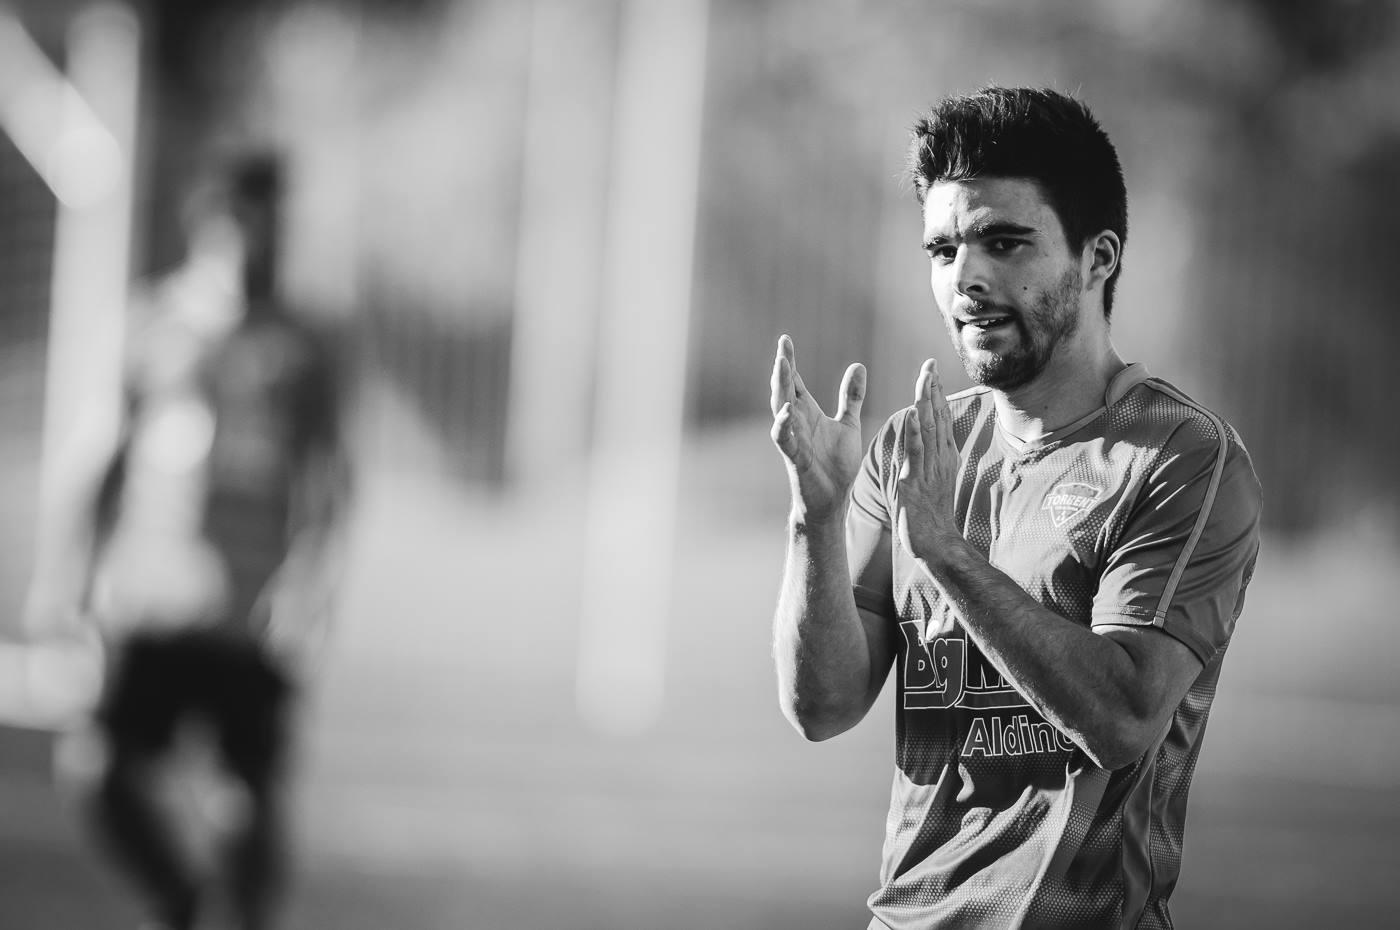 luis-escudero-fisioterapeuta-futbolista